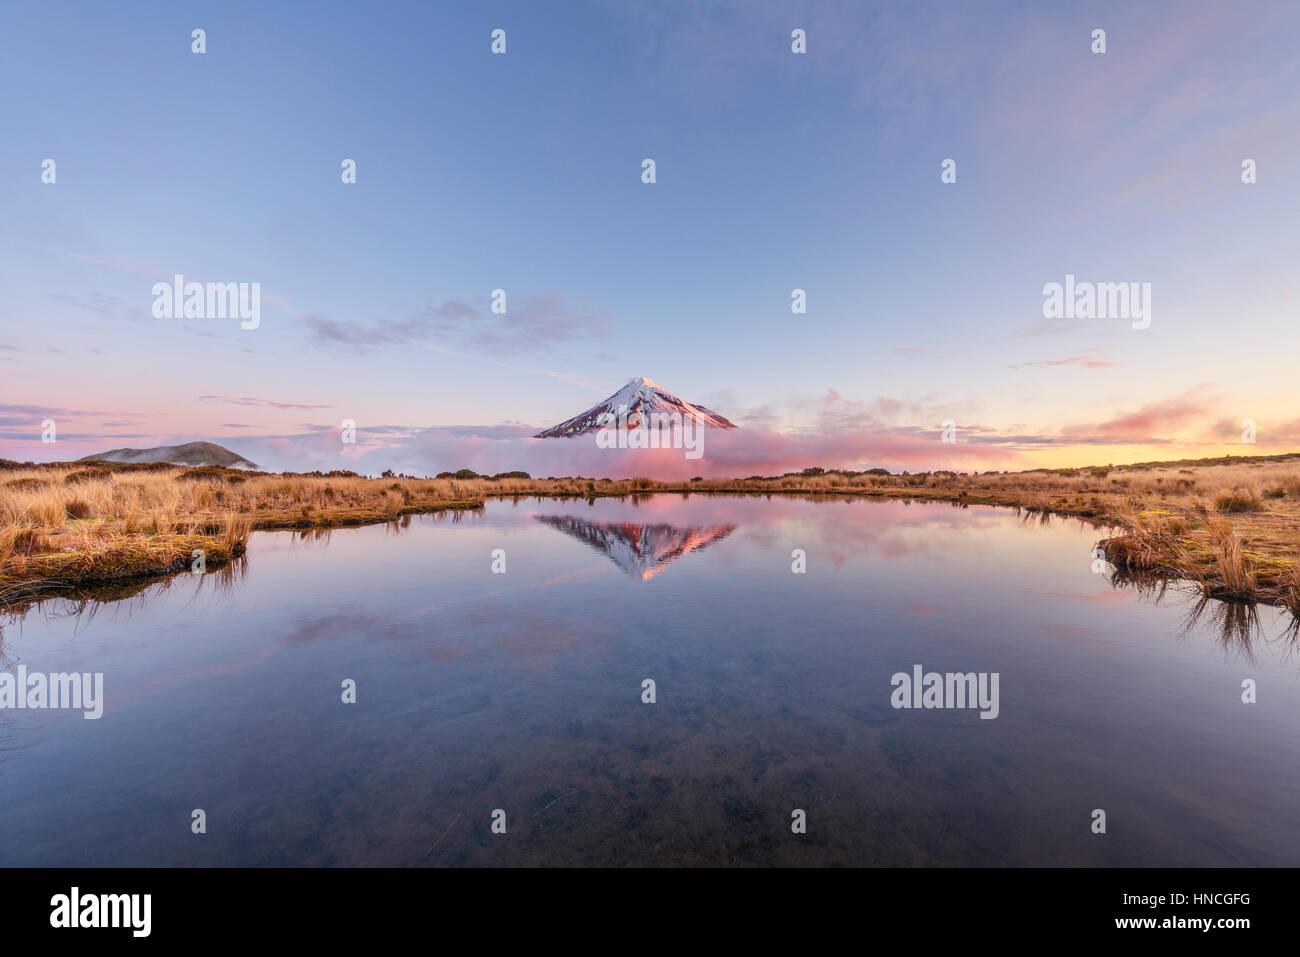 Reflection in Pouakai Tarn lake, pink clouds around stratovolcano Mount Taranaki or Mount Egmont at sunset, Egmont - Stock Image